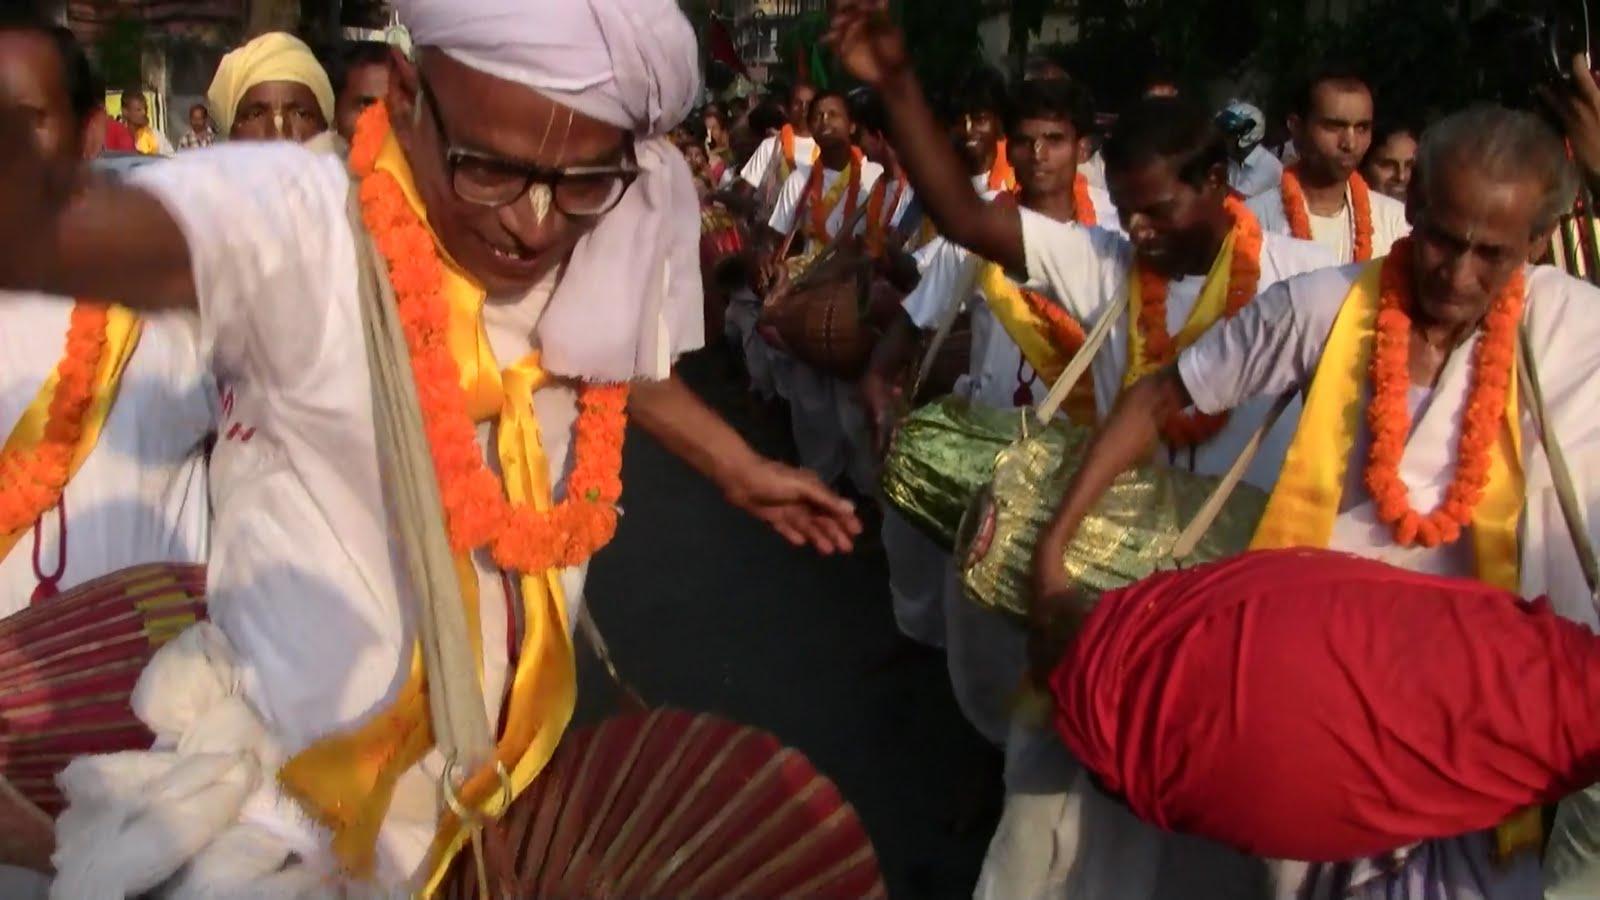 Hare Krishna News - Gaudiya News: Vyasapuja celebration of